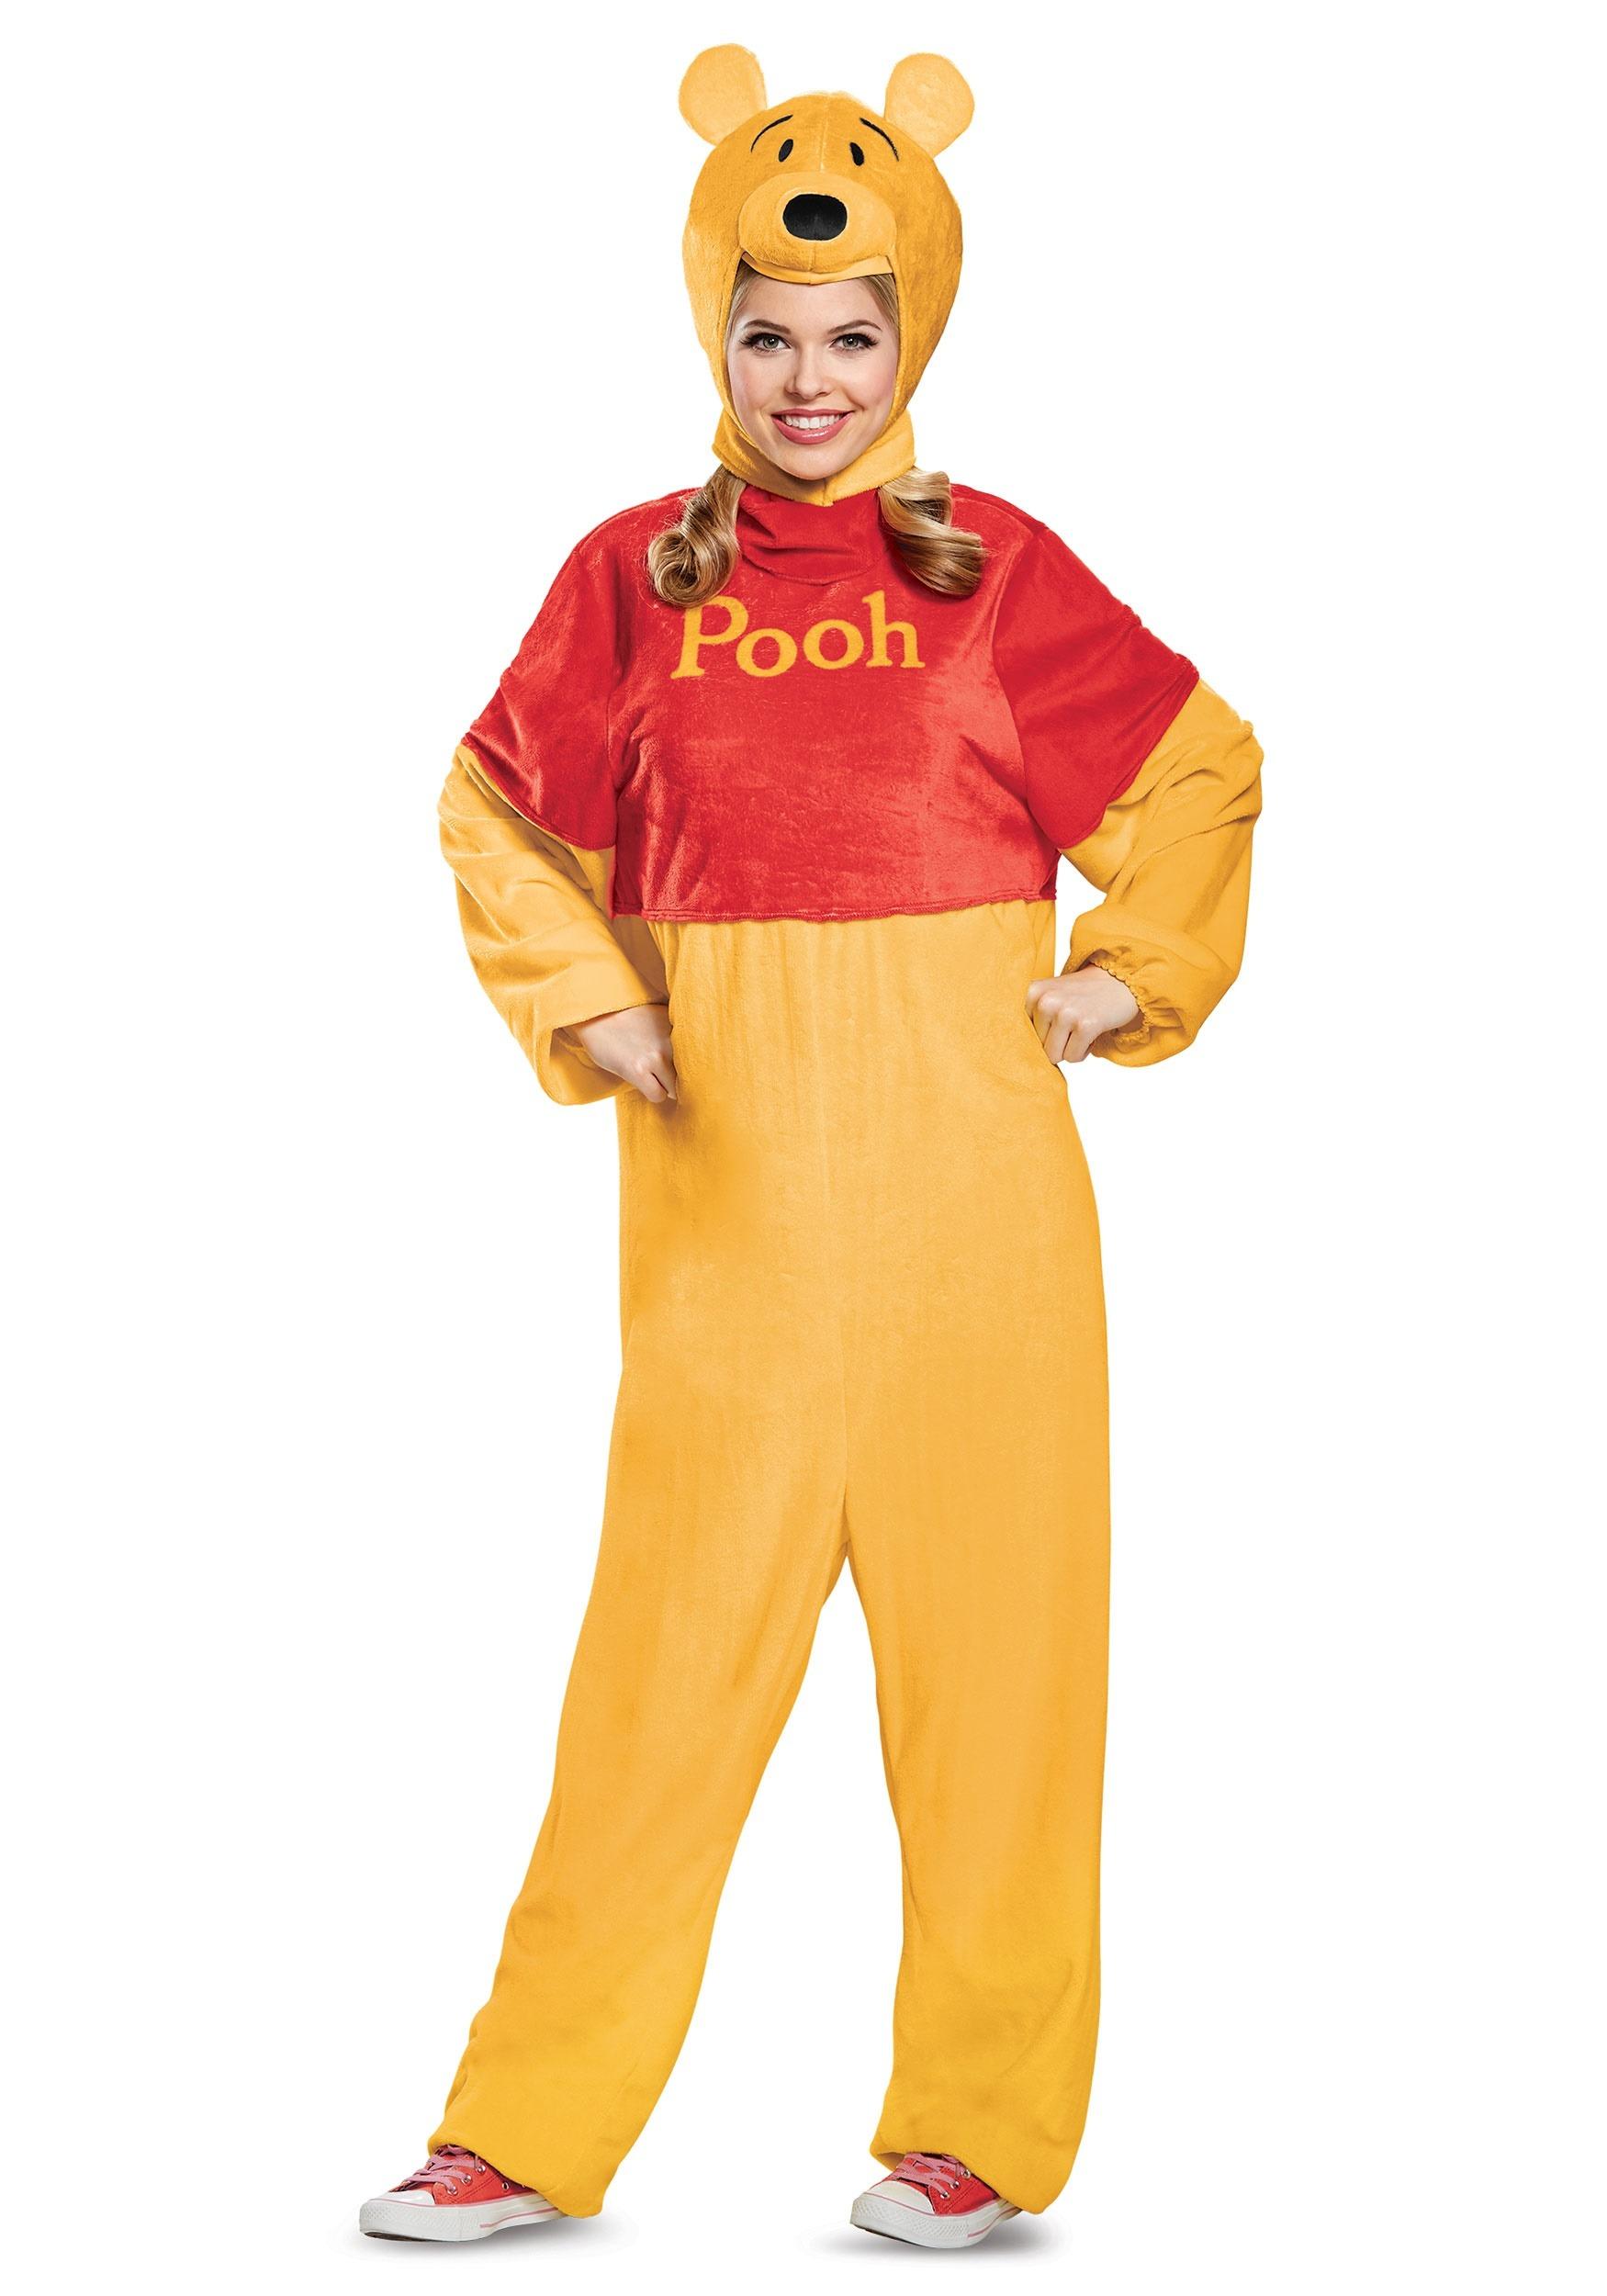 Winnie the Pooh Deluxe Adult Costume Winnie the Pooh Deluxe Adult Costume ...  sc 1 st  Halloween Costumes UK & Winnie the Pooh Deluxe Costume for Adults